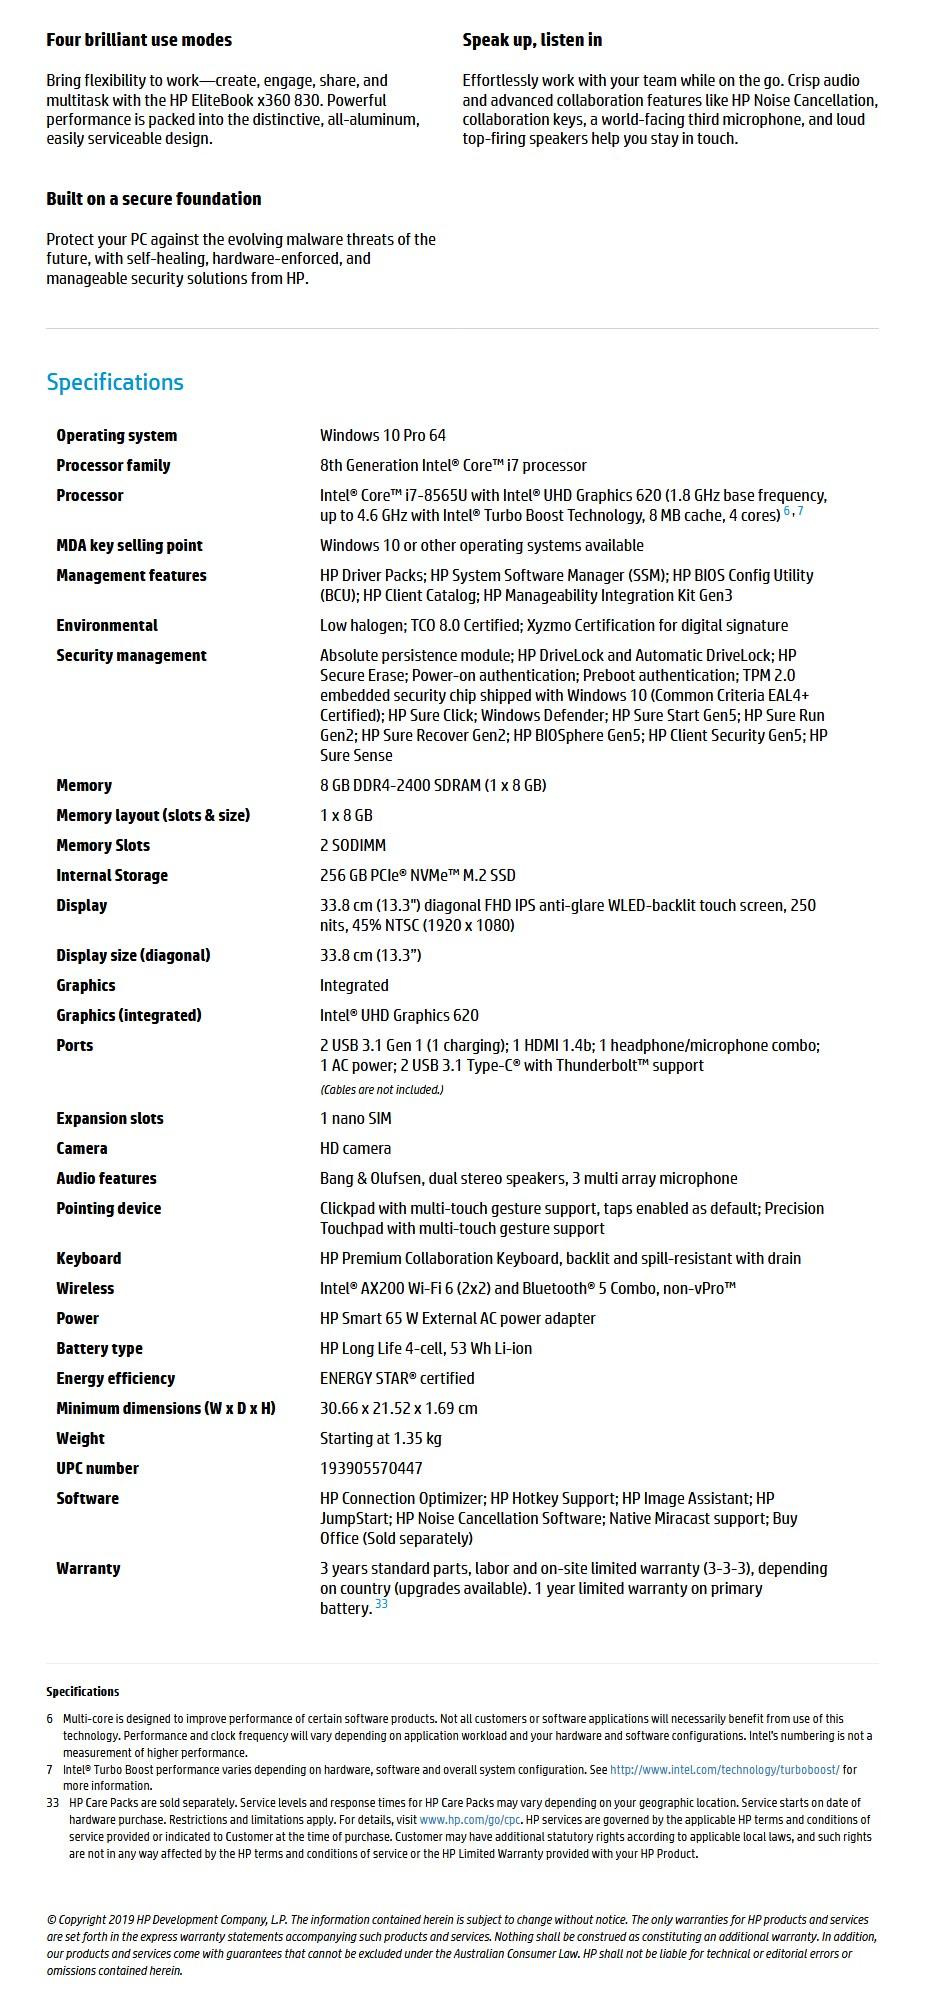 "HP EliteBook x360 830 G6 13.3"" Laptop i7-8565U 8GB 256GB W10P Touch - Overview 1"